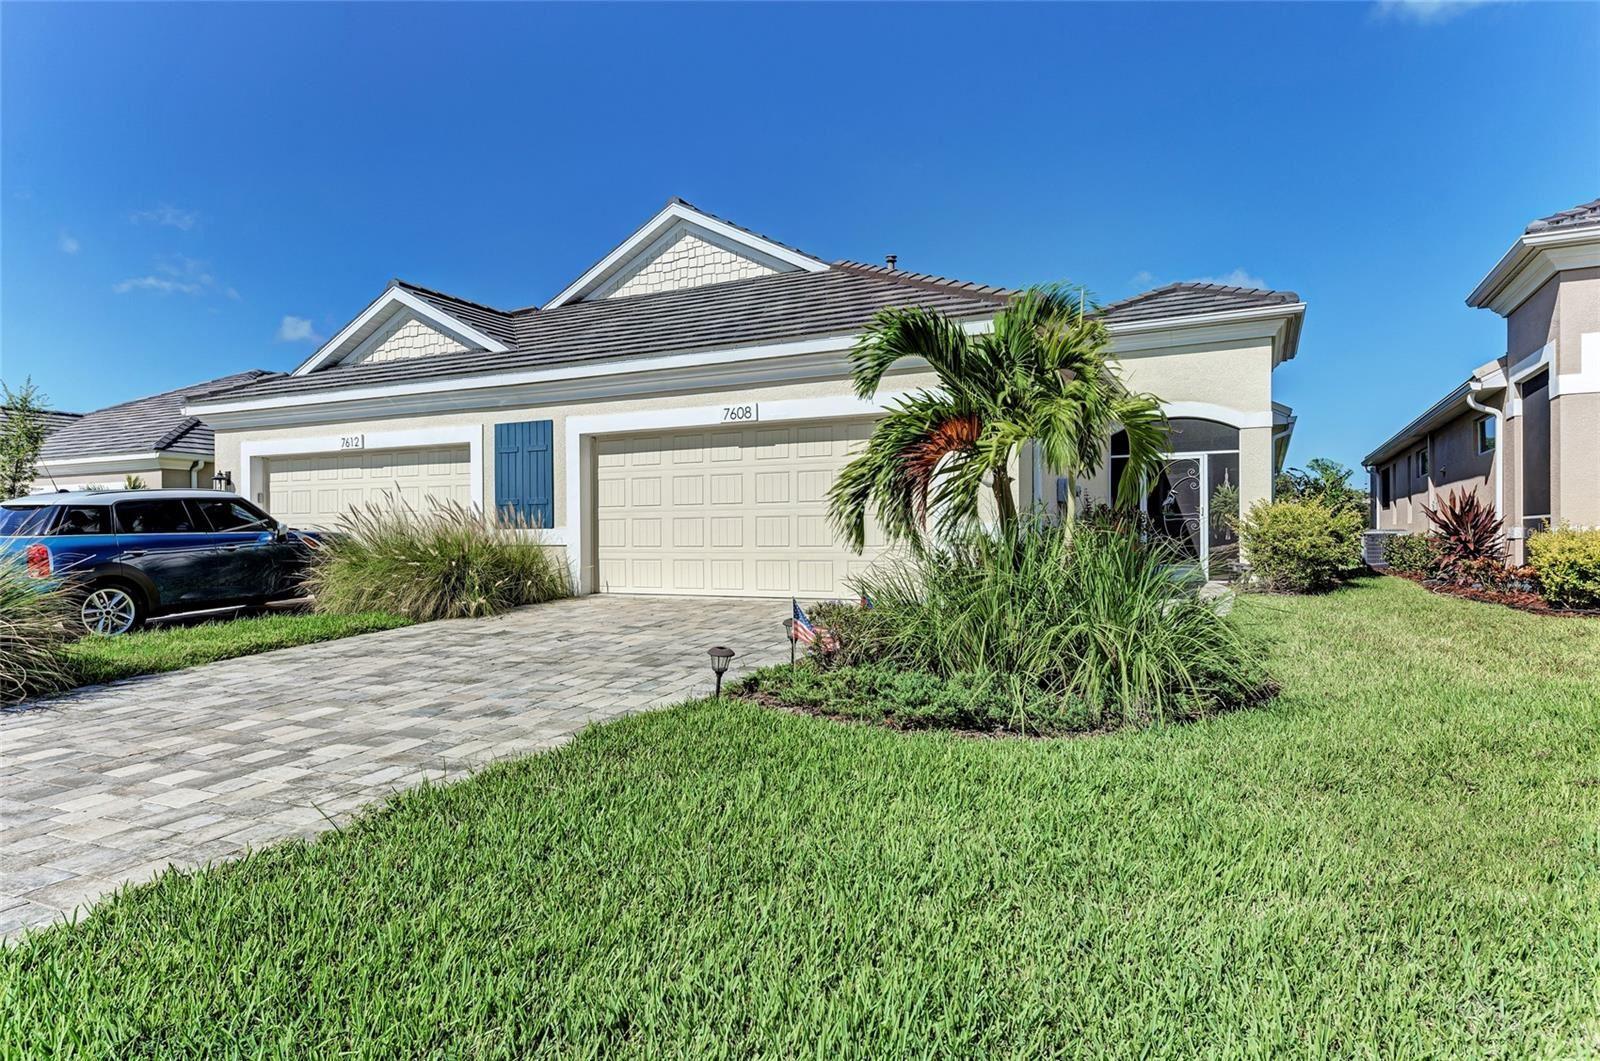 7608 REGISTRAR WAY, Sarasota, FL 34243 - #: A4512429